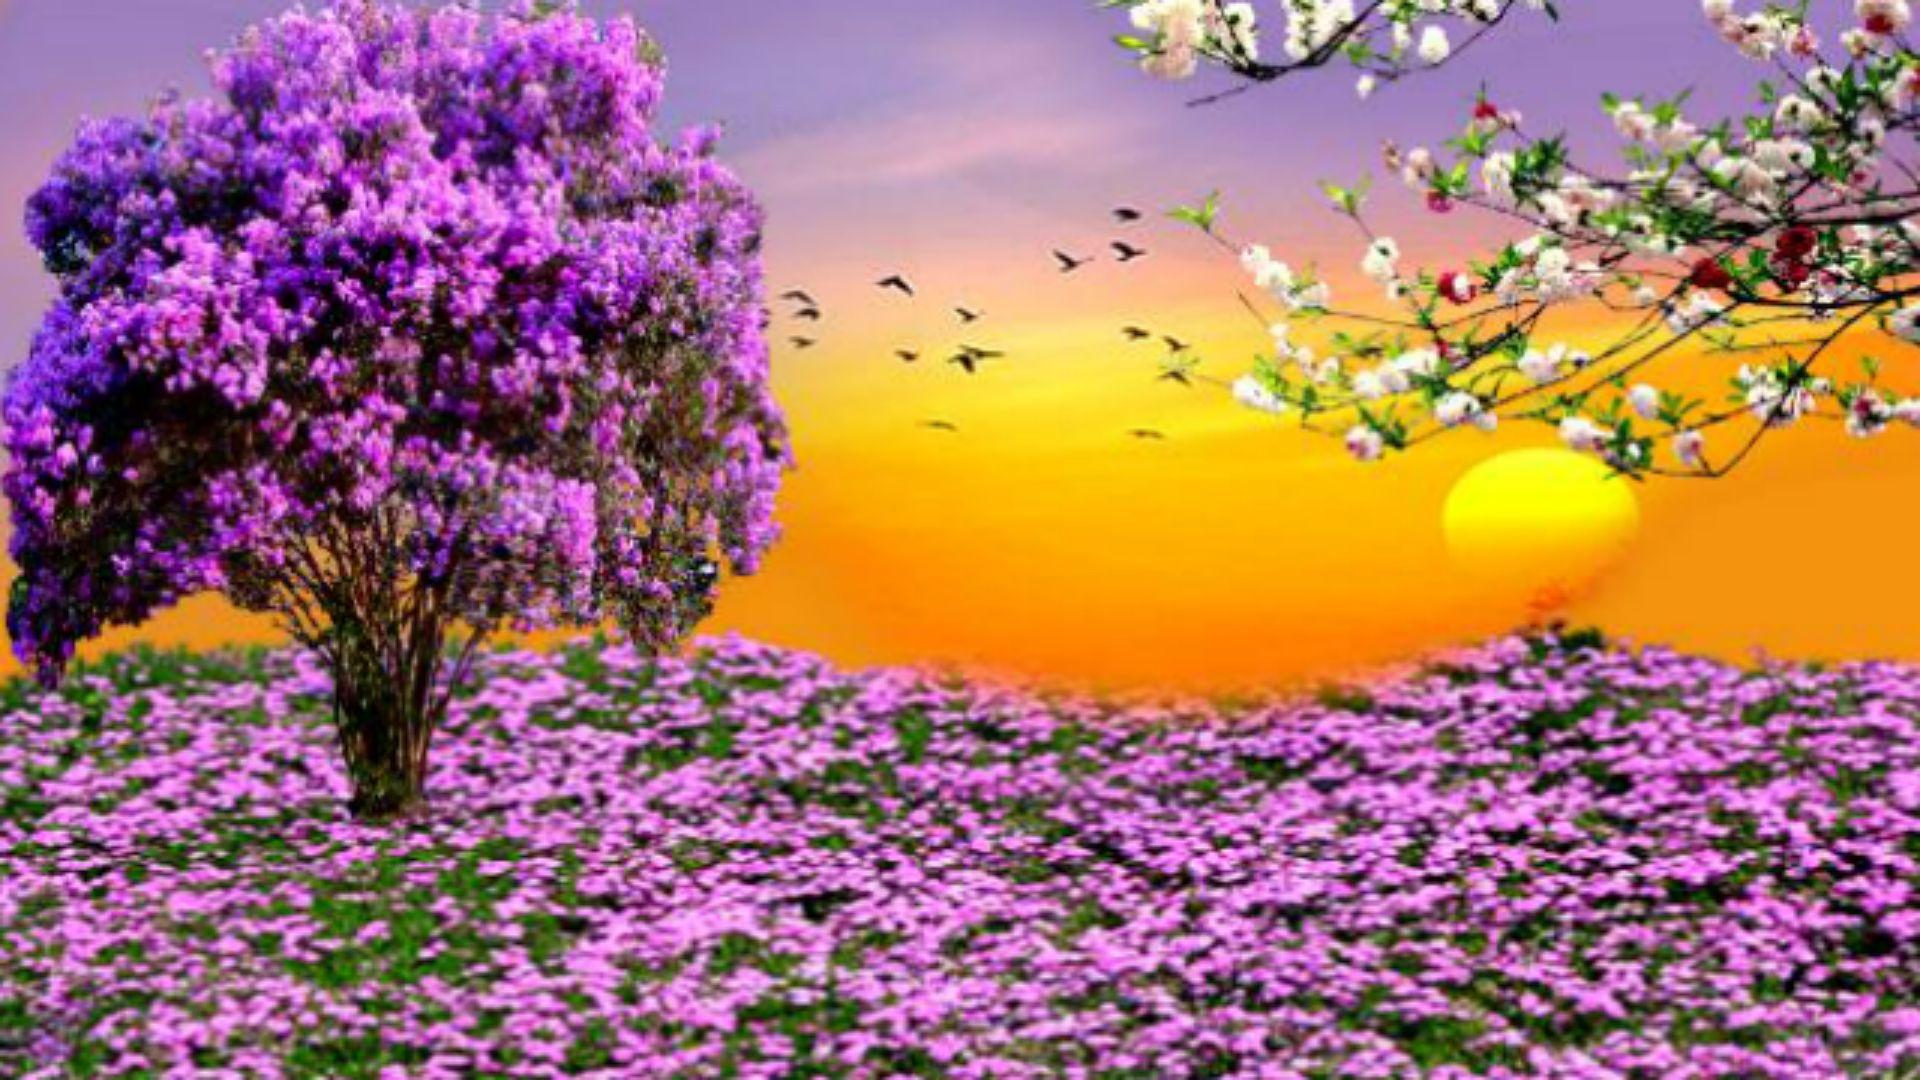 Spring HD Desktop Wallpaper Spring Desktop Wallpapers 1920x1080